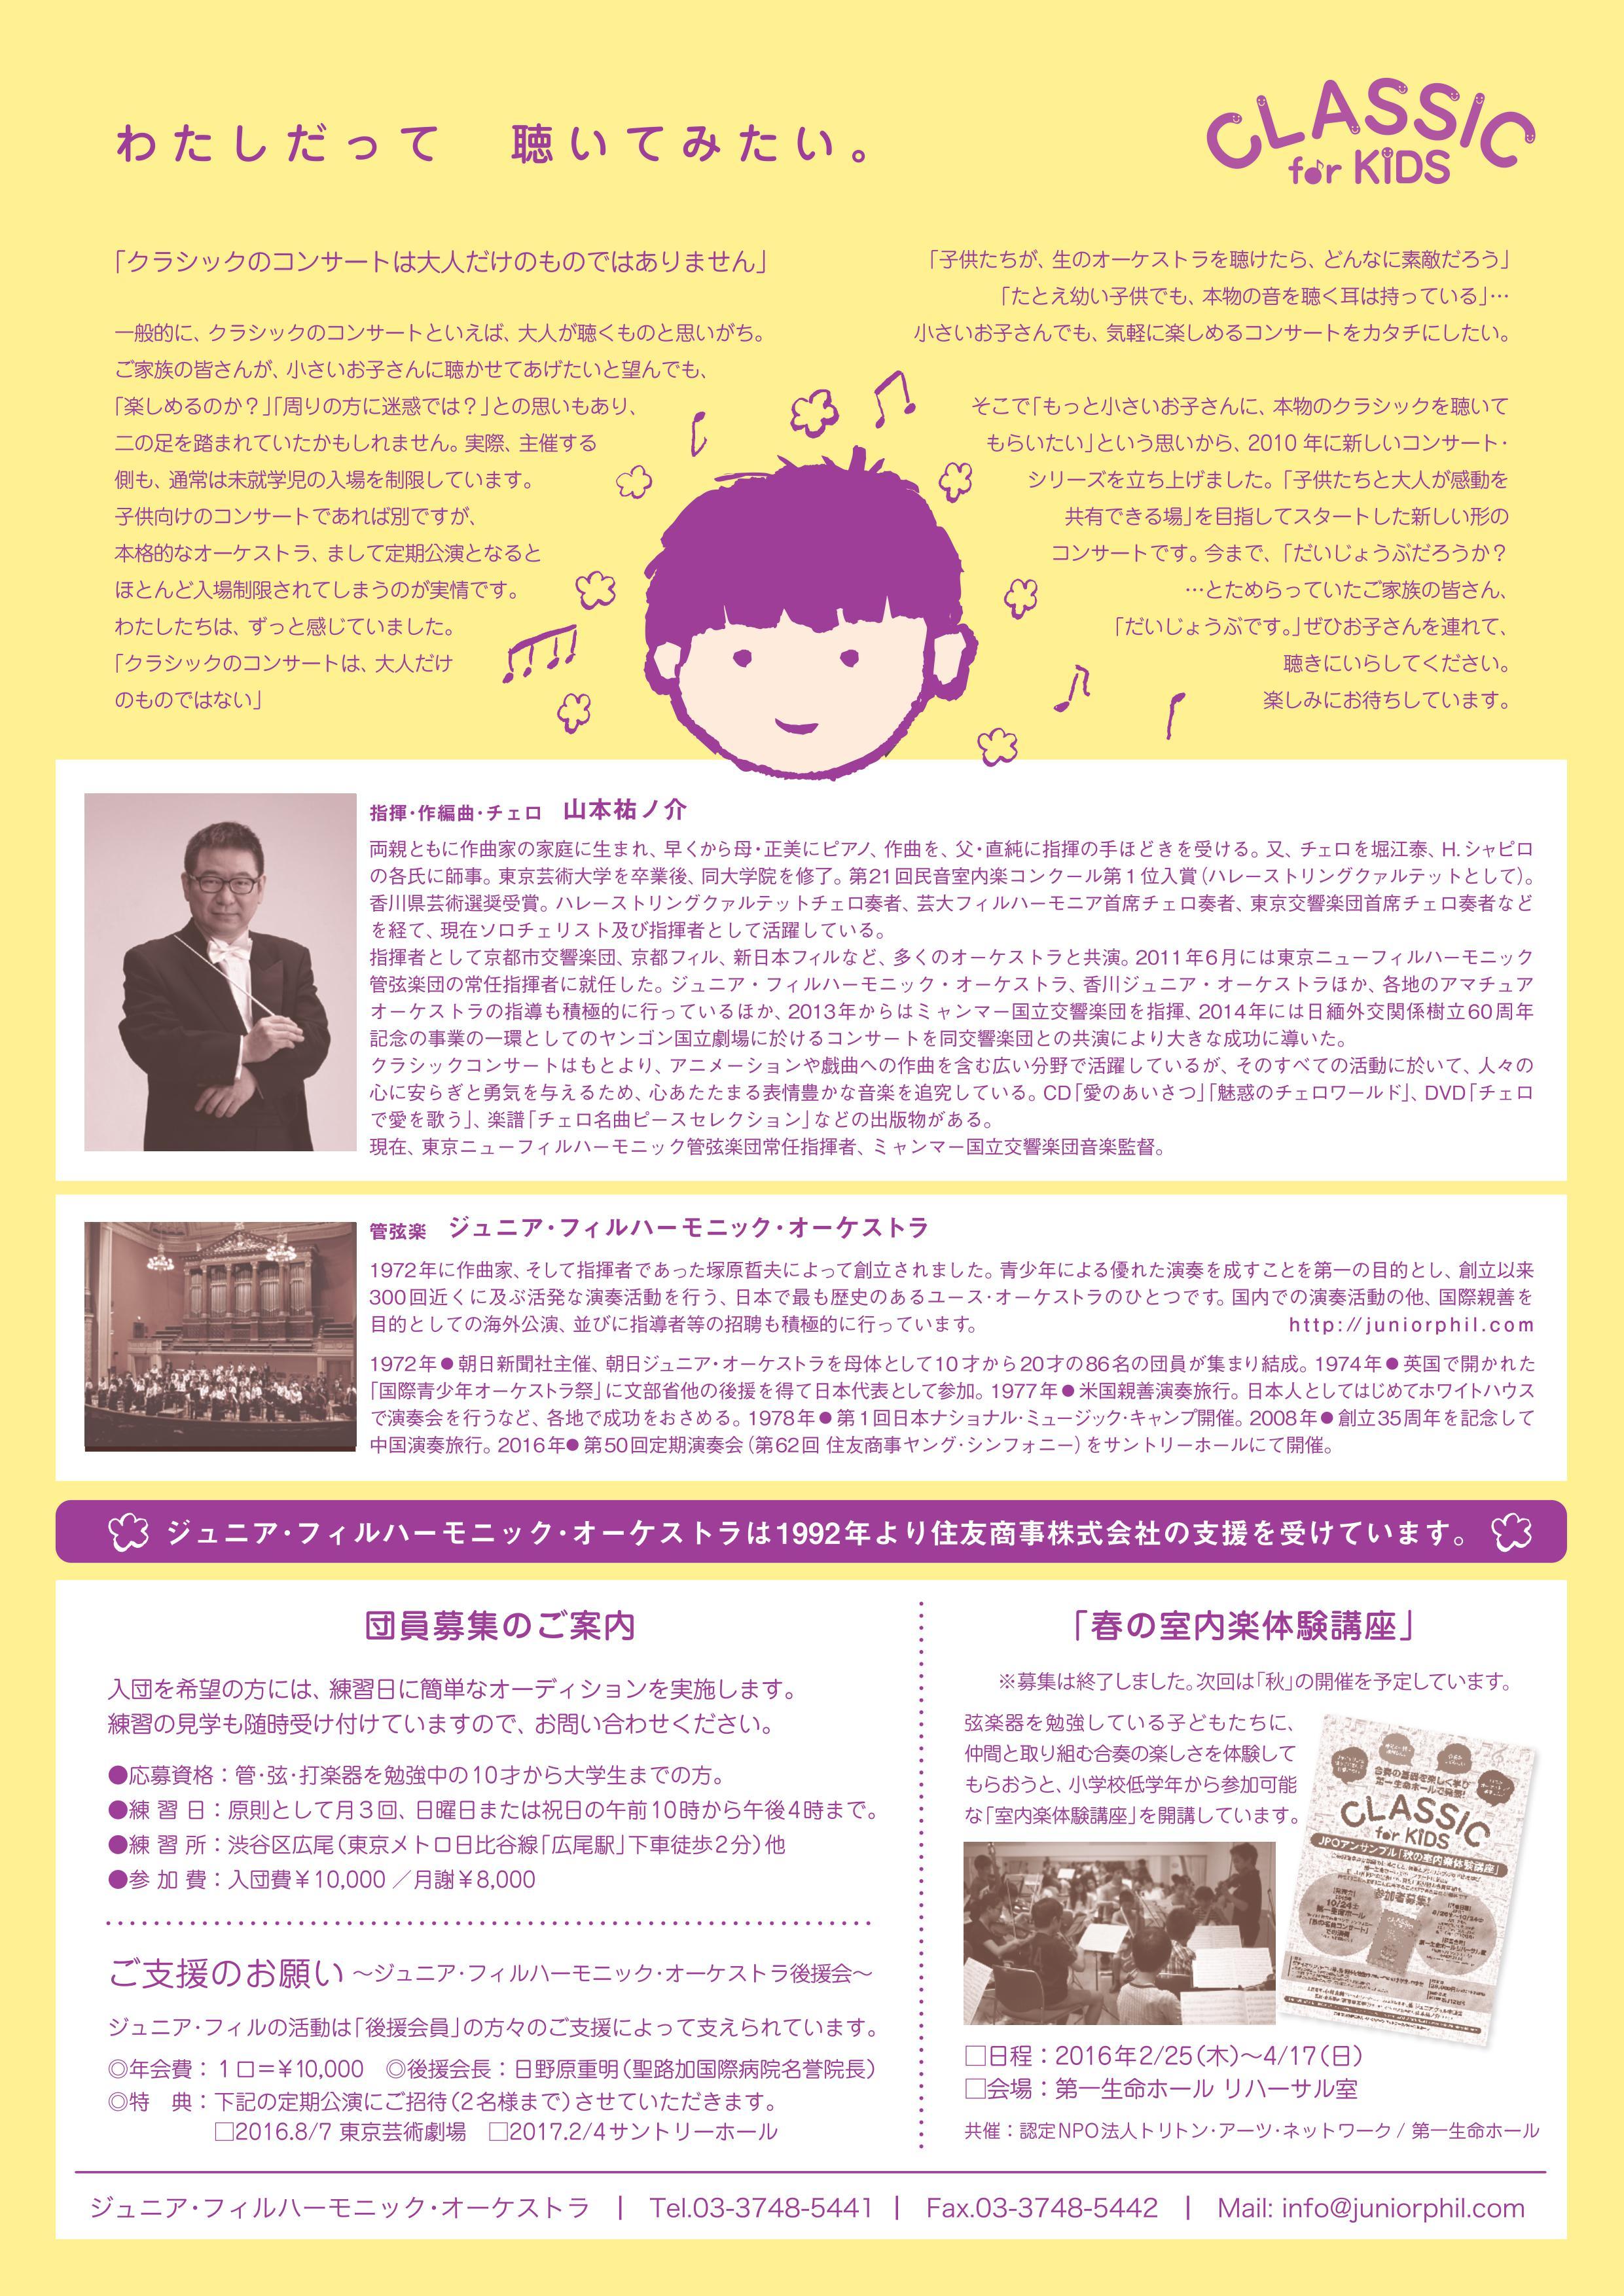 CLASSIC for KIDS ~TV・映画の中のオーケストラ~ ura